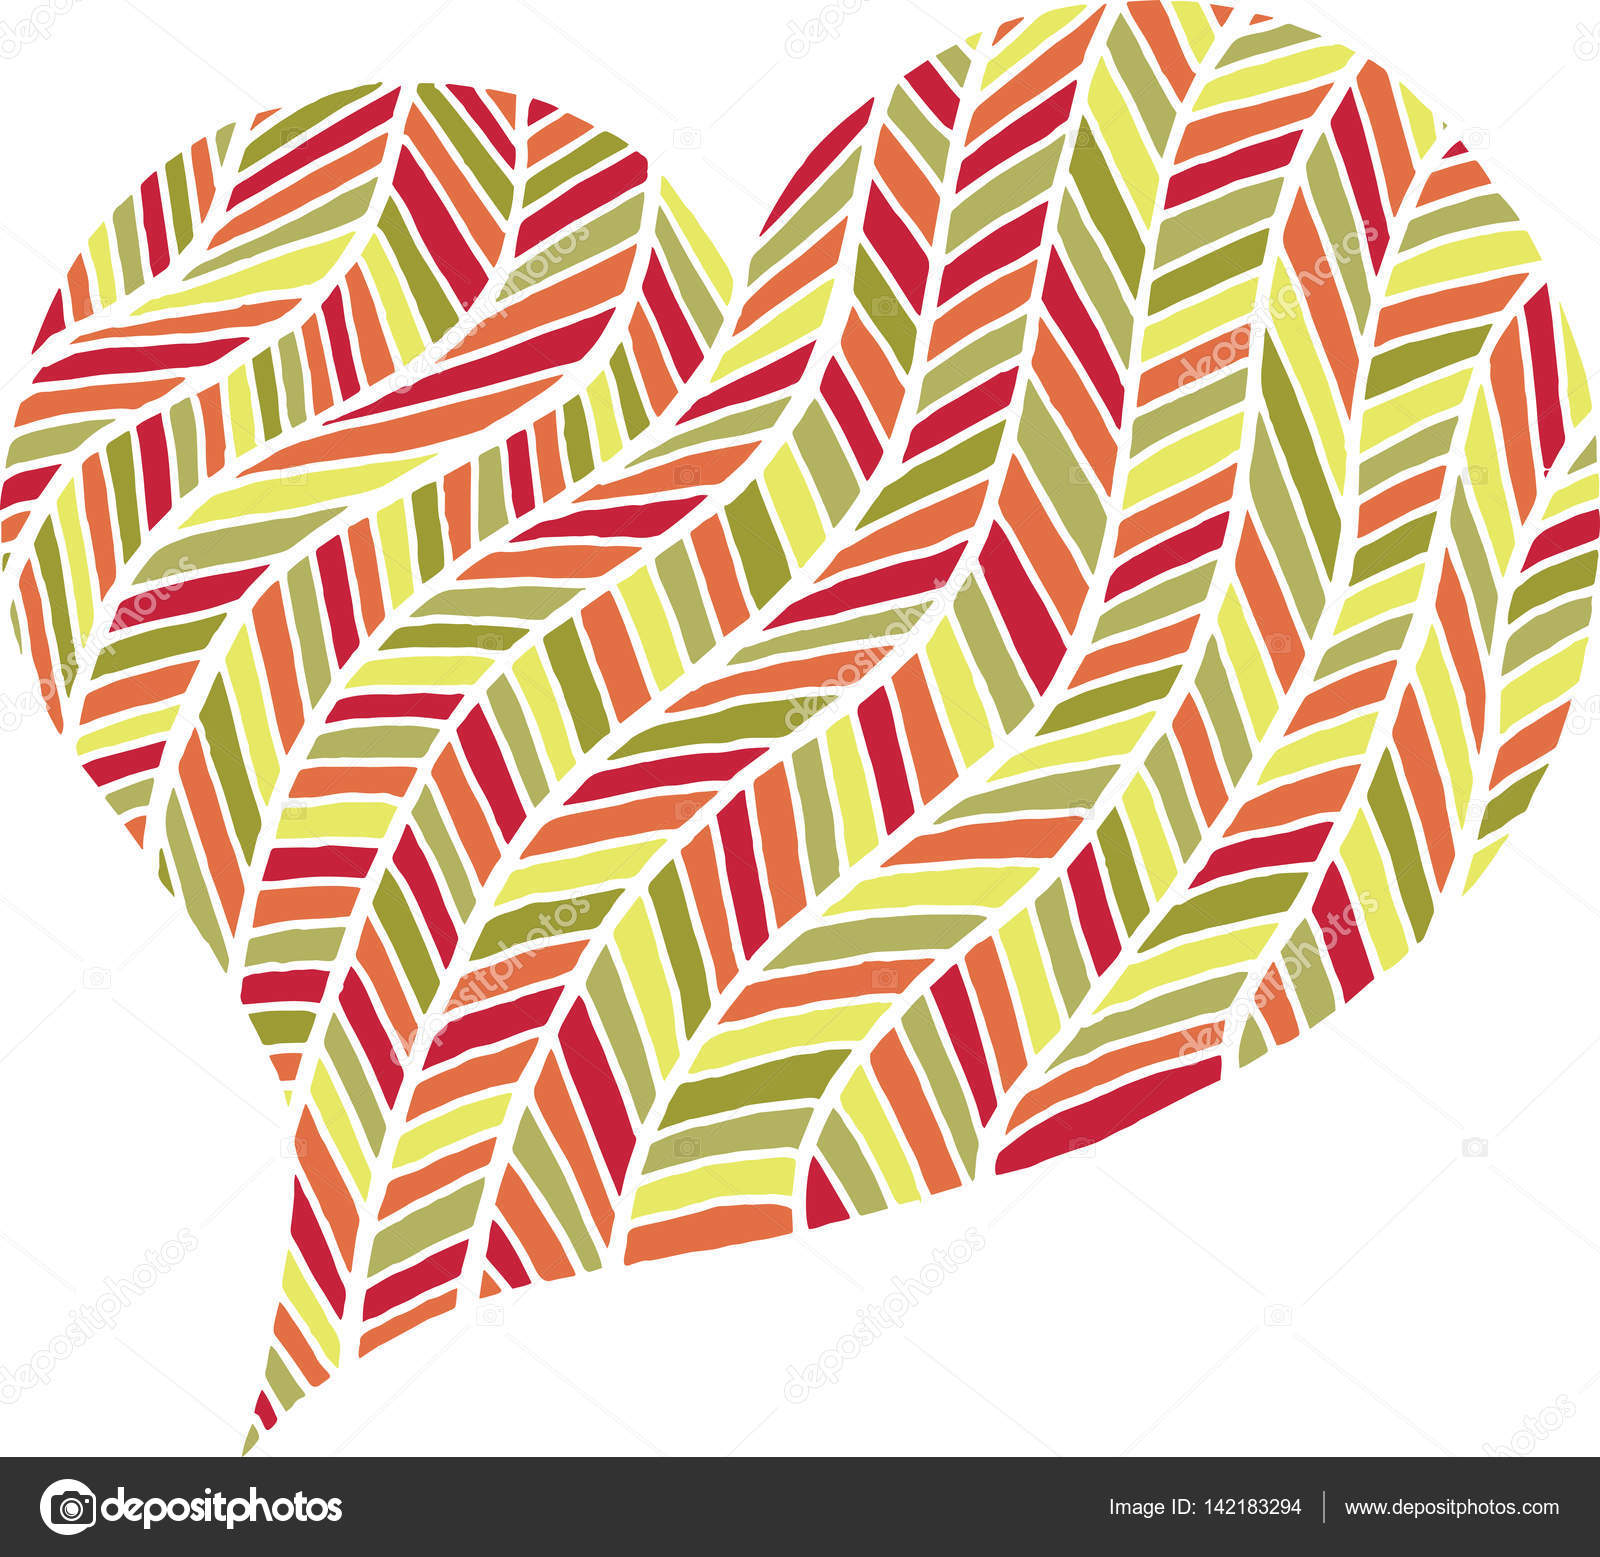 Valentines Day Zentangle Black And White Heart Symbol Stock Photo